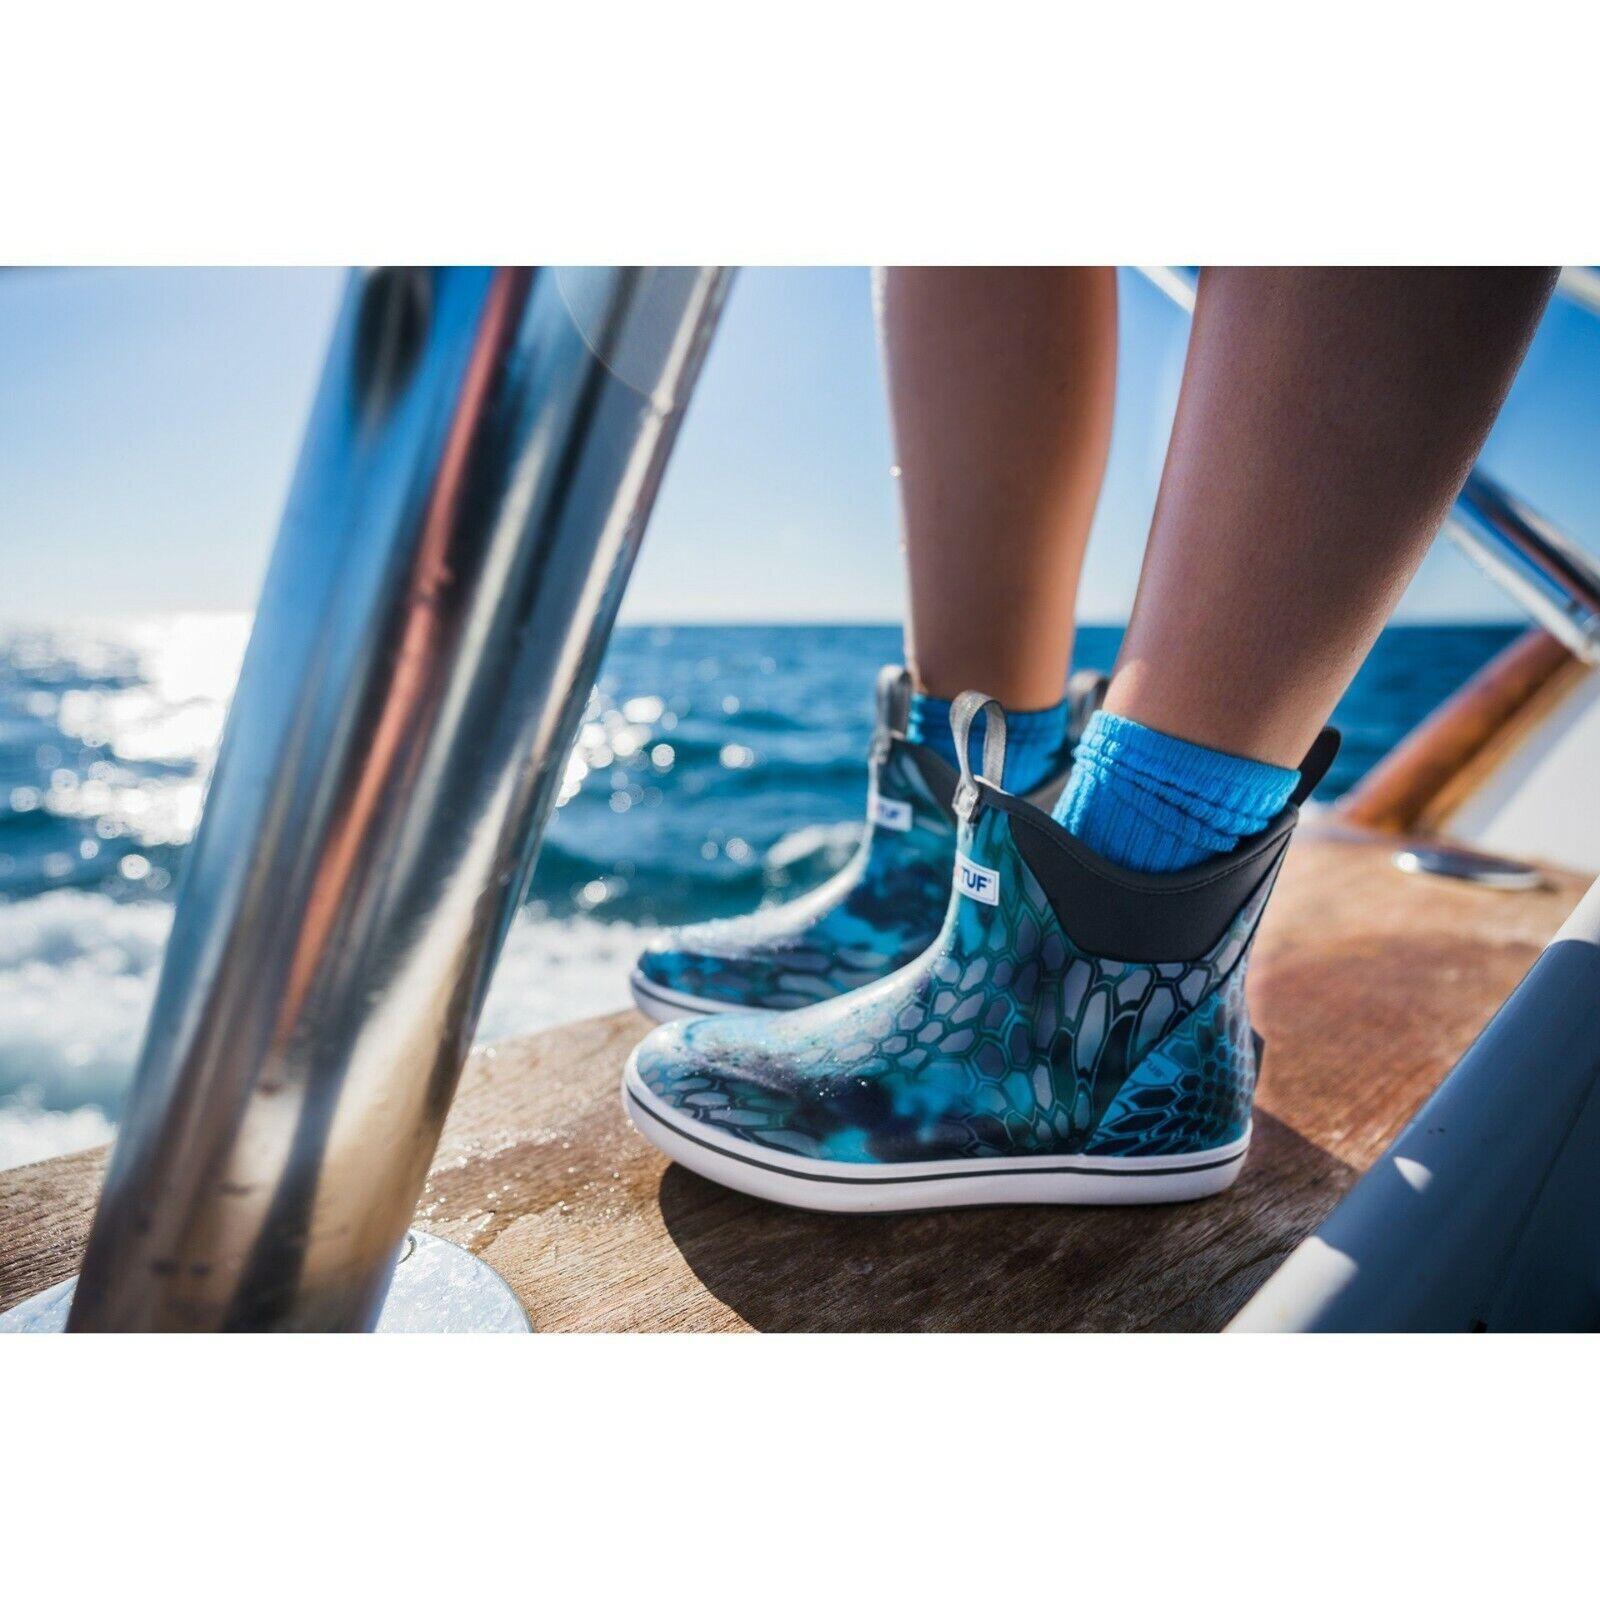 XTRATUF para mujer 6  Kryptek Ponto tobillo Cubierta  bota-Pesca canotaje-Elige tamaño  estilo clásico